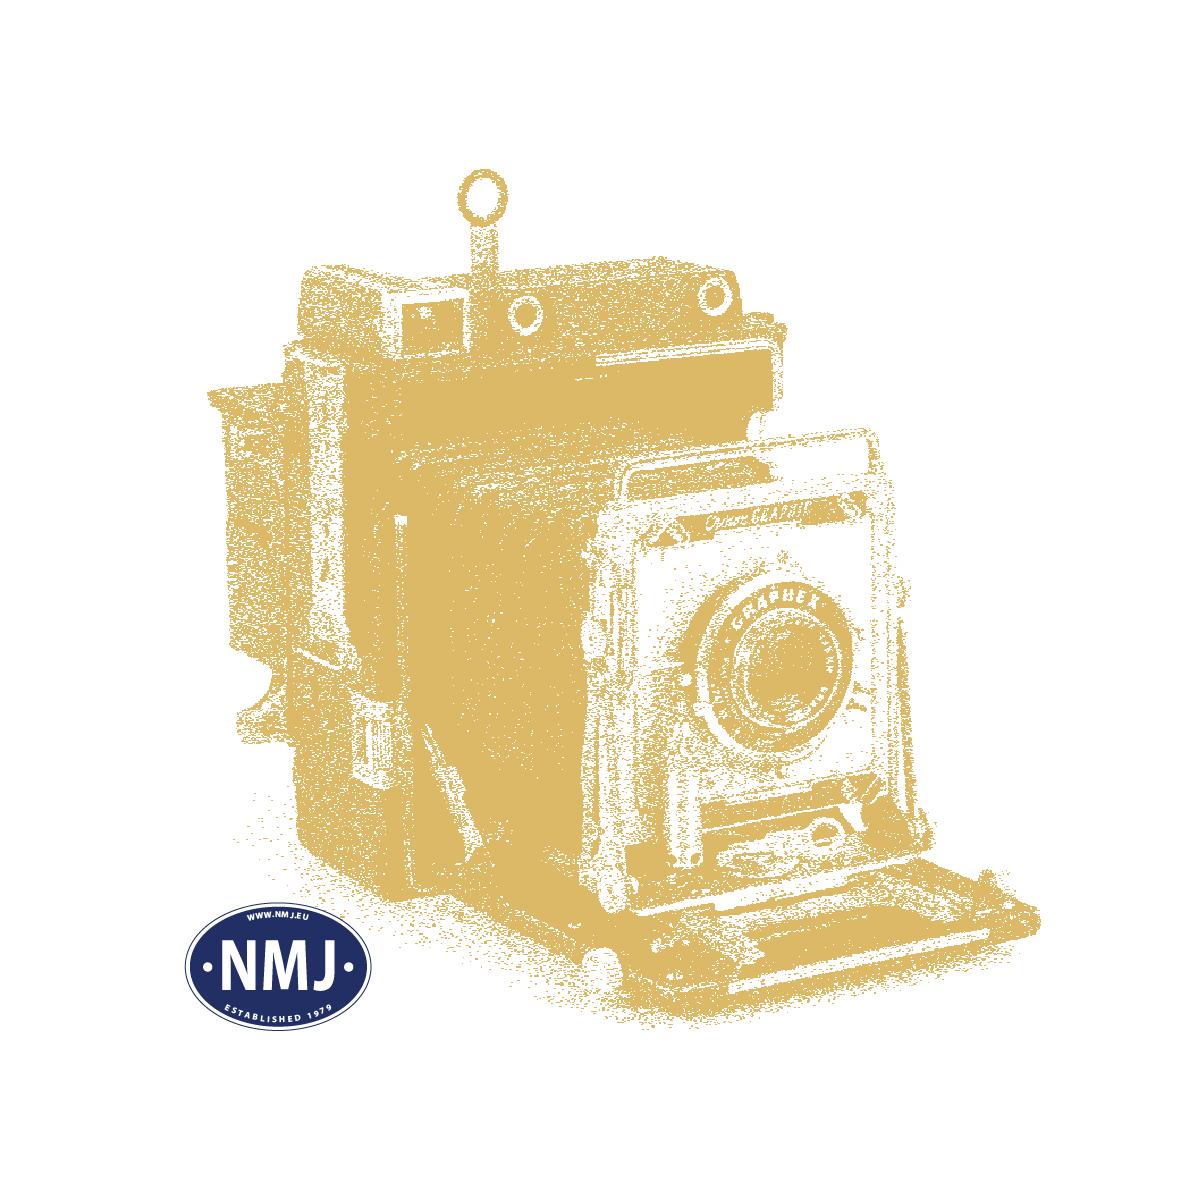 NMJT122.304 - NMJ Topline NSB B7-4 27004